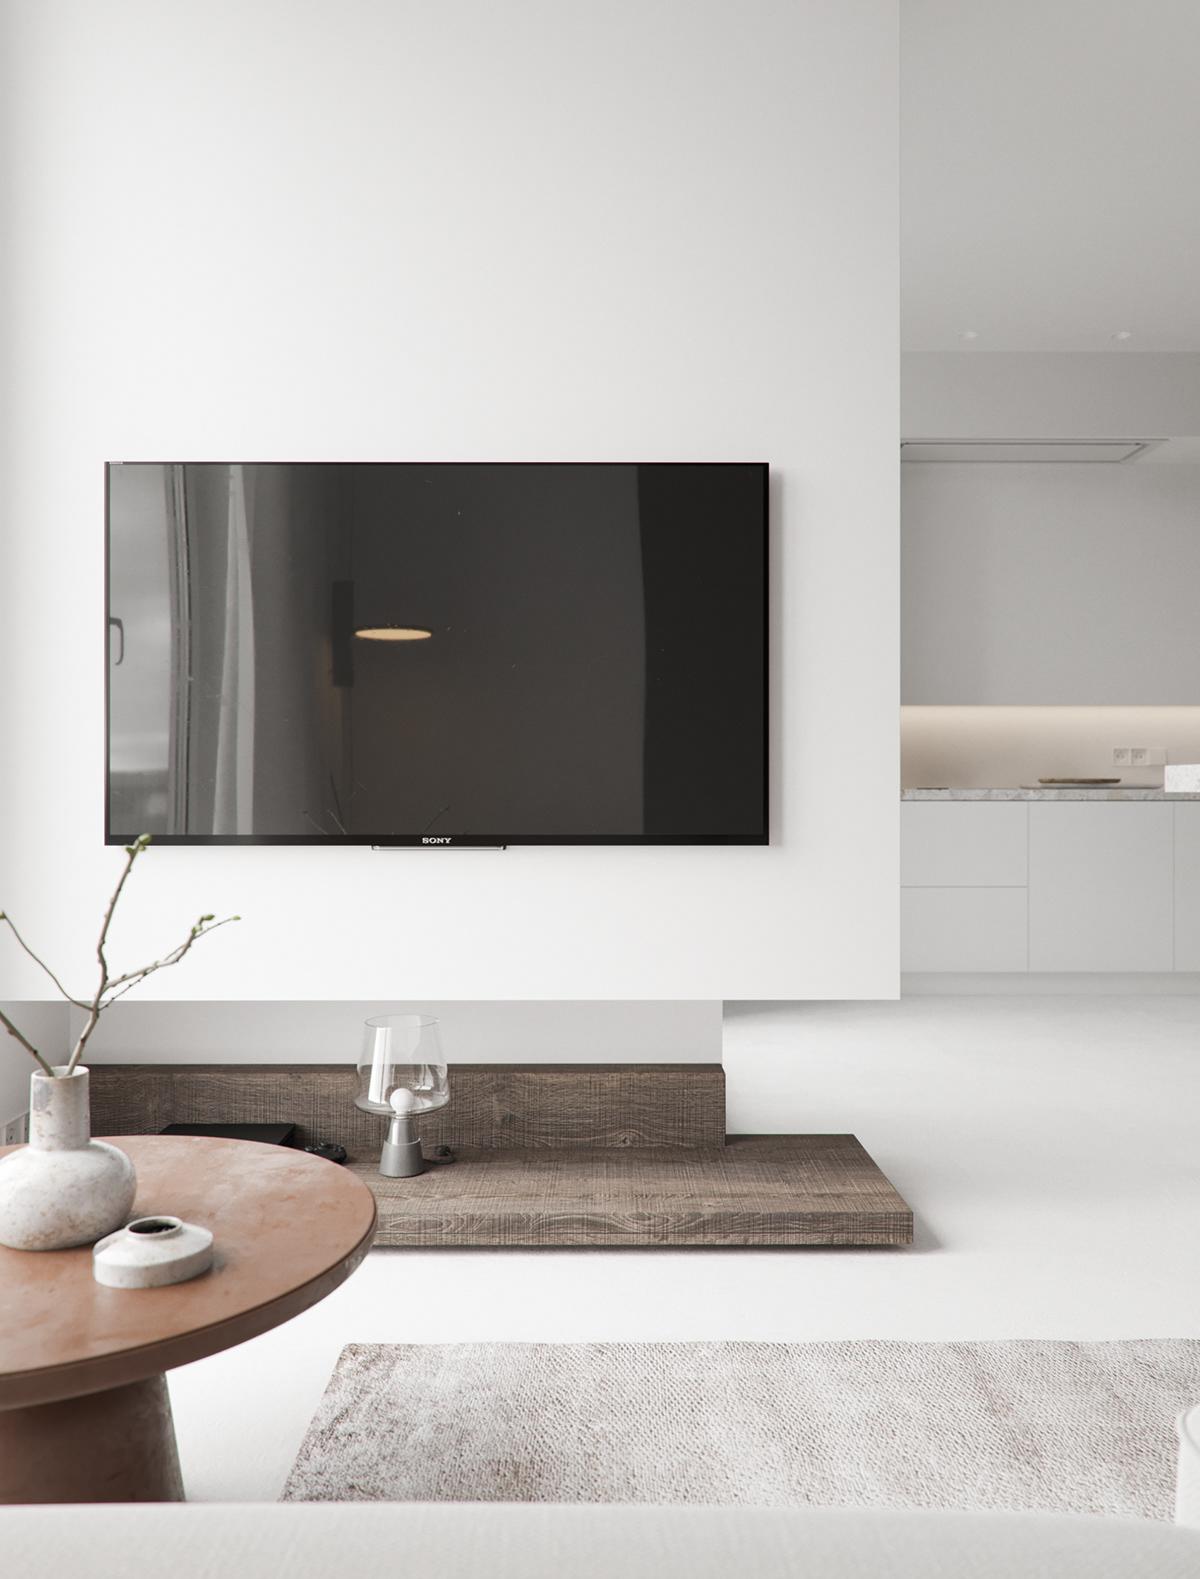 architecture interior design  design minimalist minimalistic White wood minsk kotraarchitects